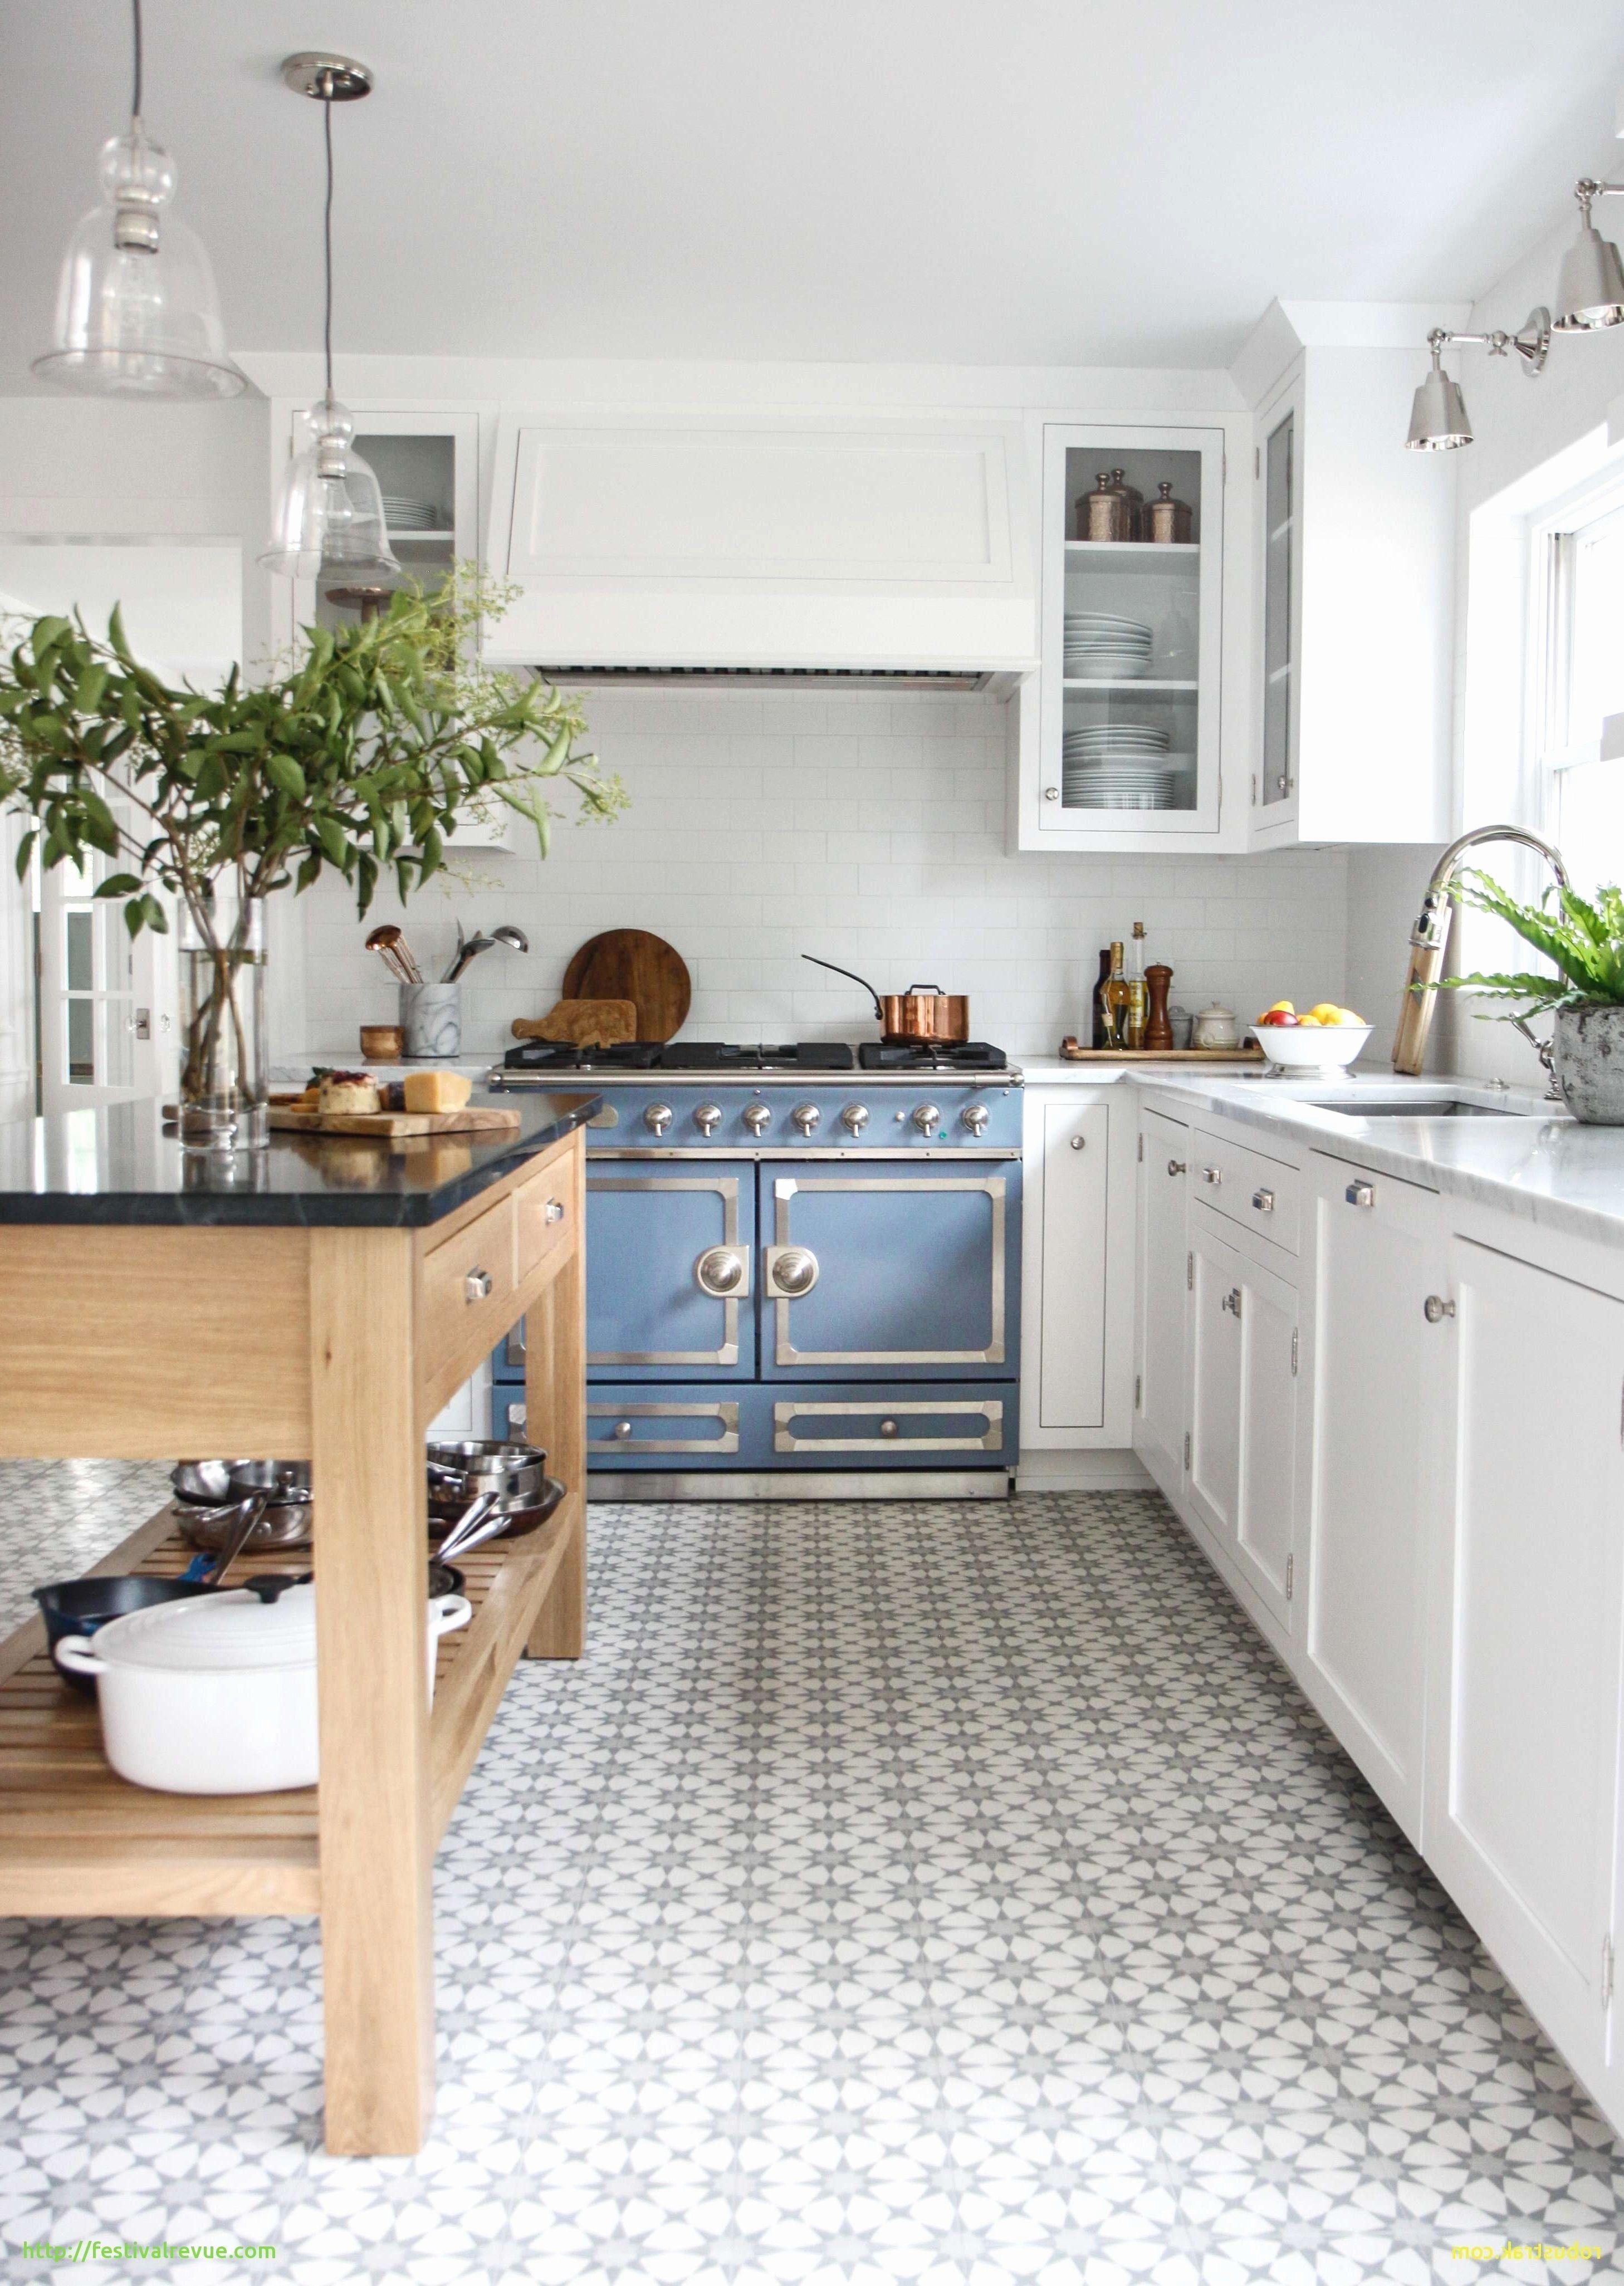 Unique Removable Wallpaper Kitchen Inexpensive Kitchen Cabinets Small Cottage Kitchen Cottage Kitchen Design